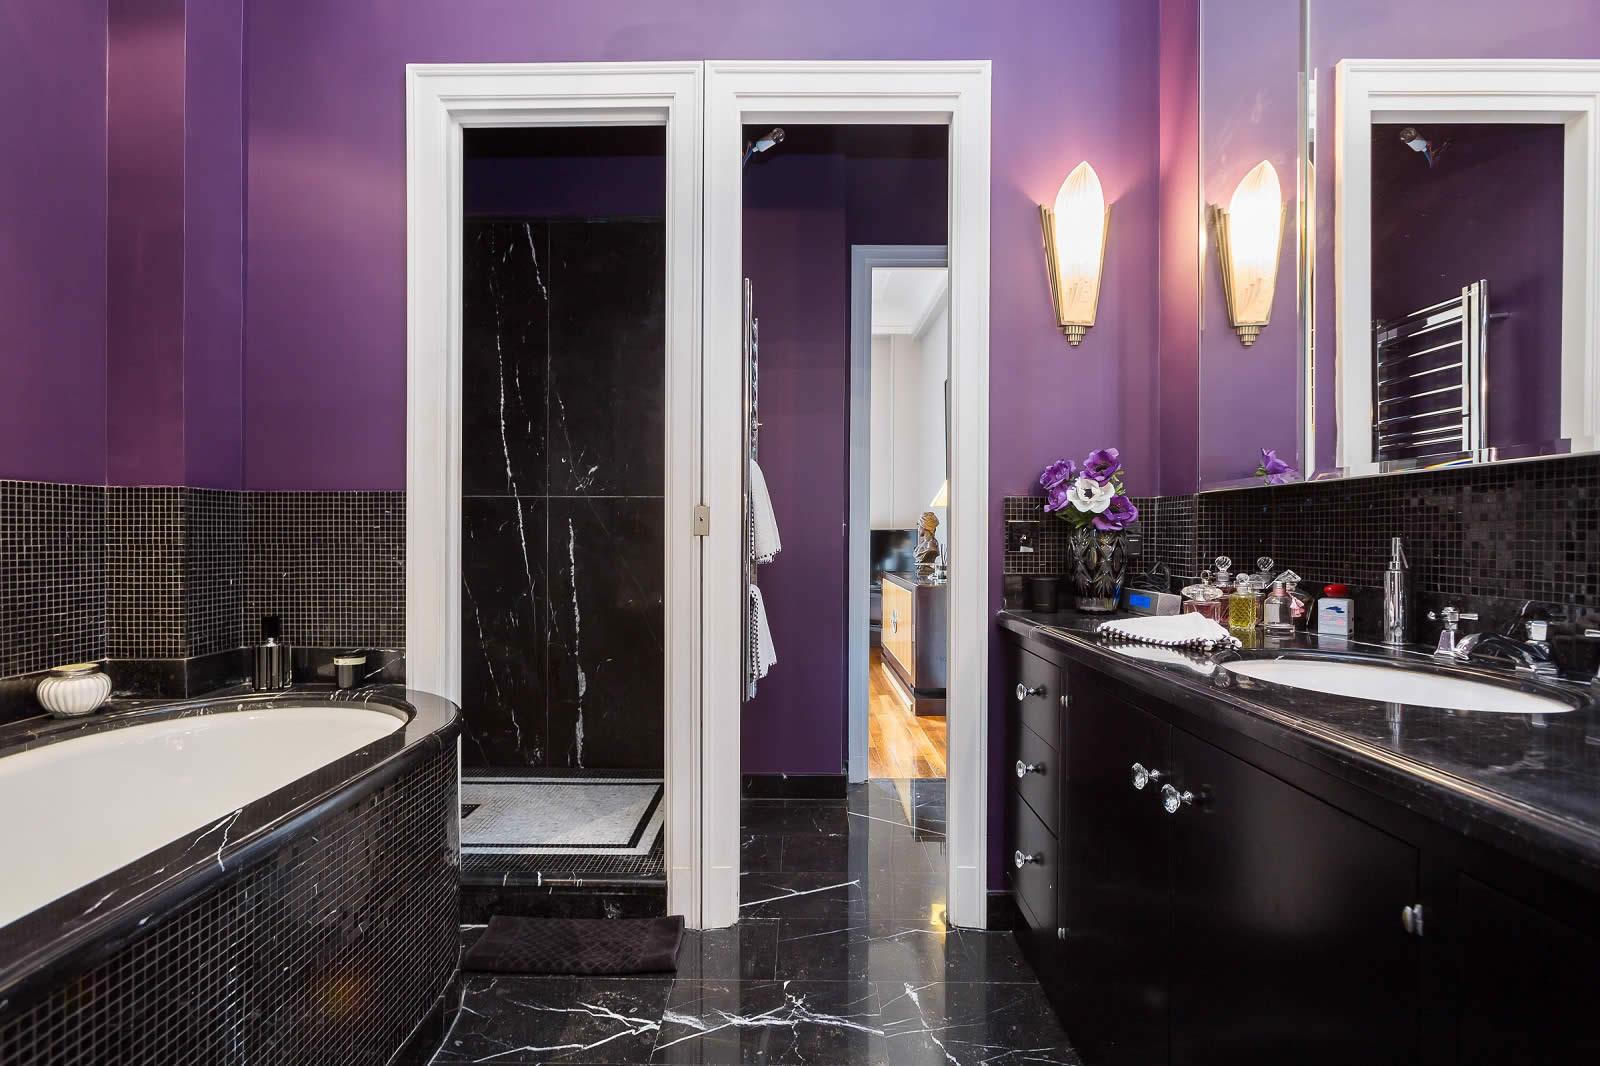 appartement-renove-a-vendre-7eme-arrondissement-2-chambres